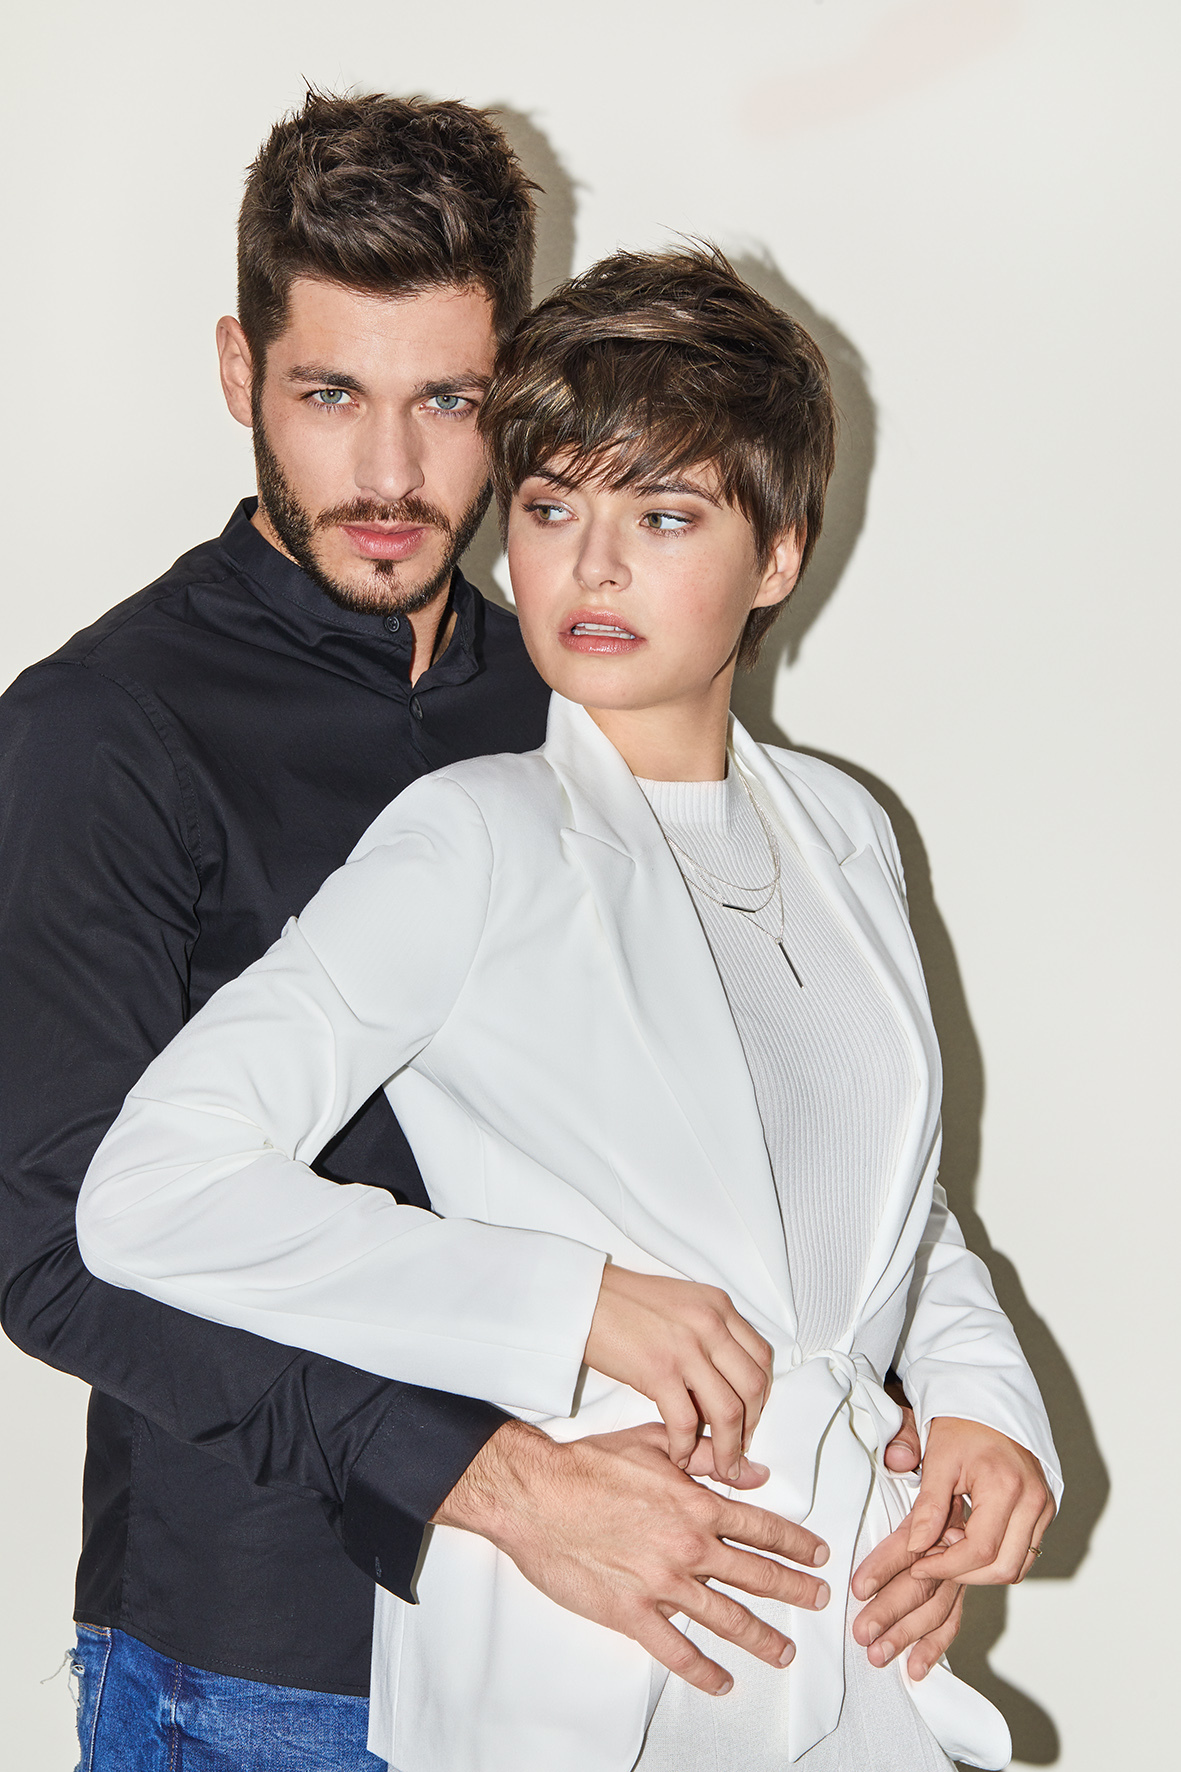 KLIPP-Trendlooks-2019-Sensual-Secrets-Lily-Jan-Shortcut-Pixie-Cut